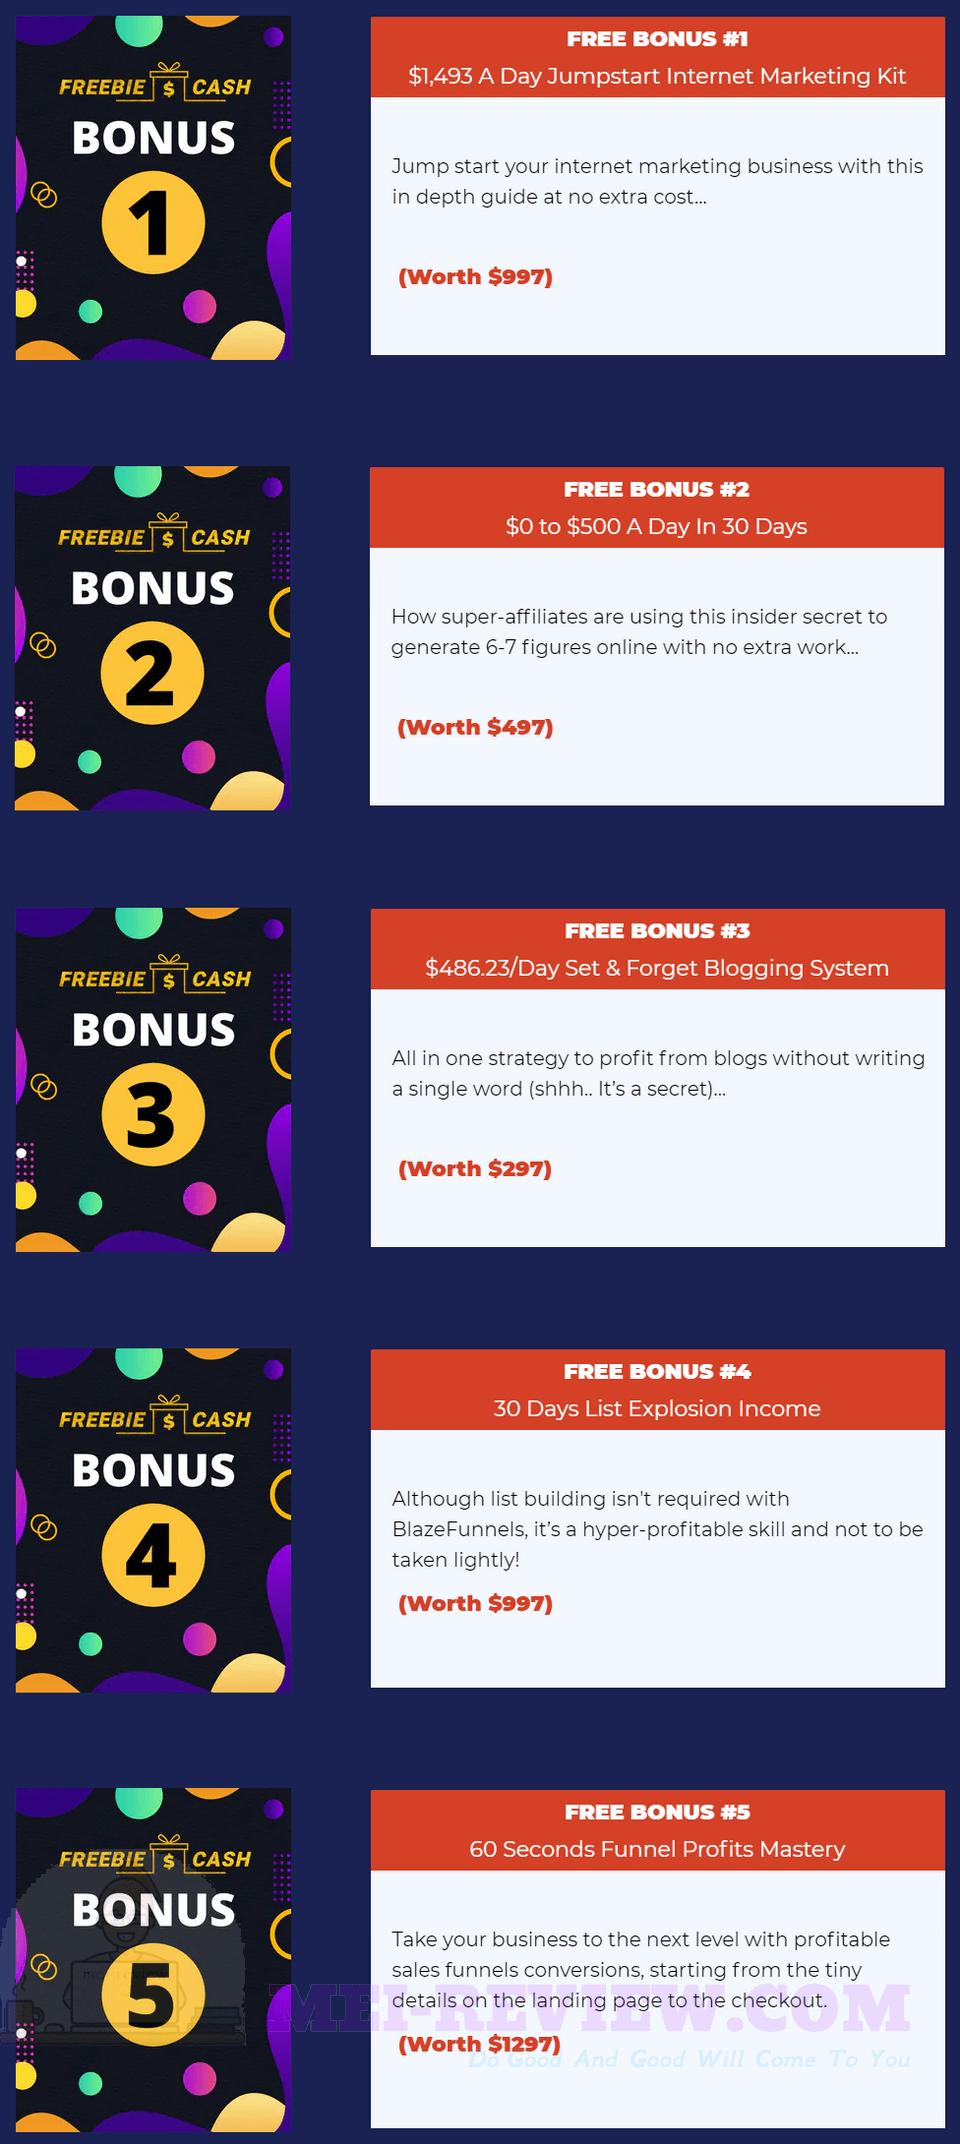 FreebieCash-bonus-1